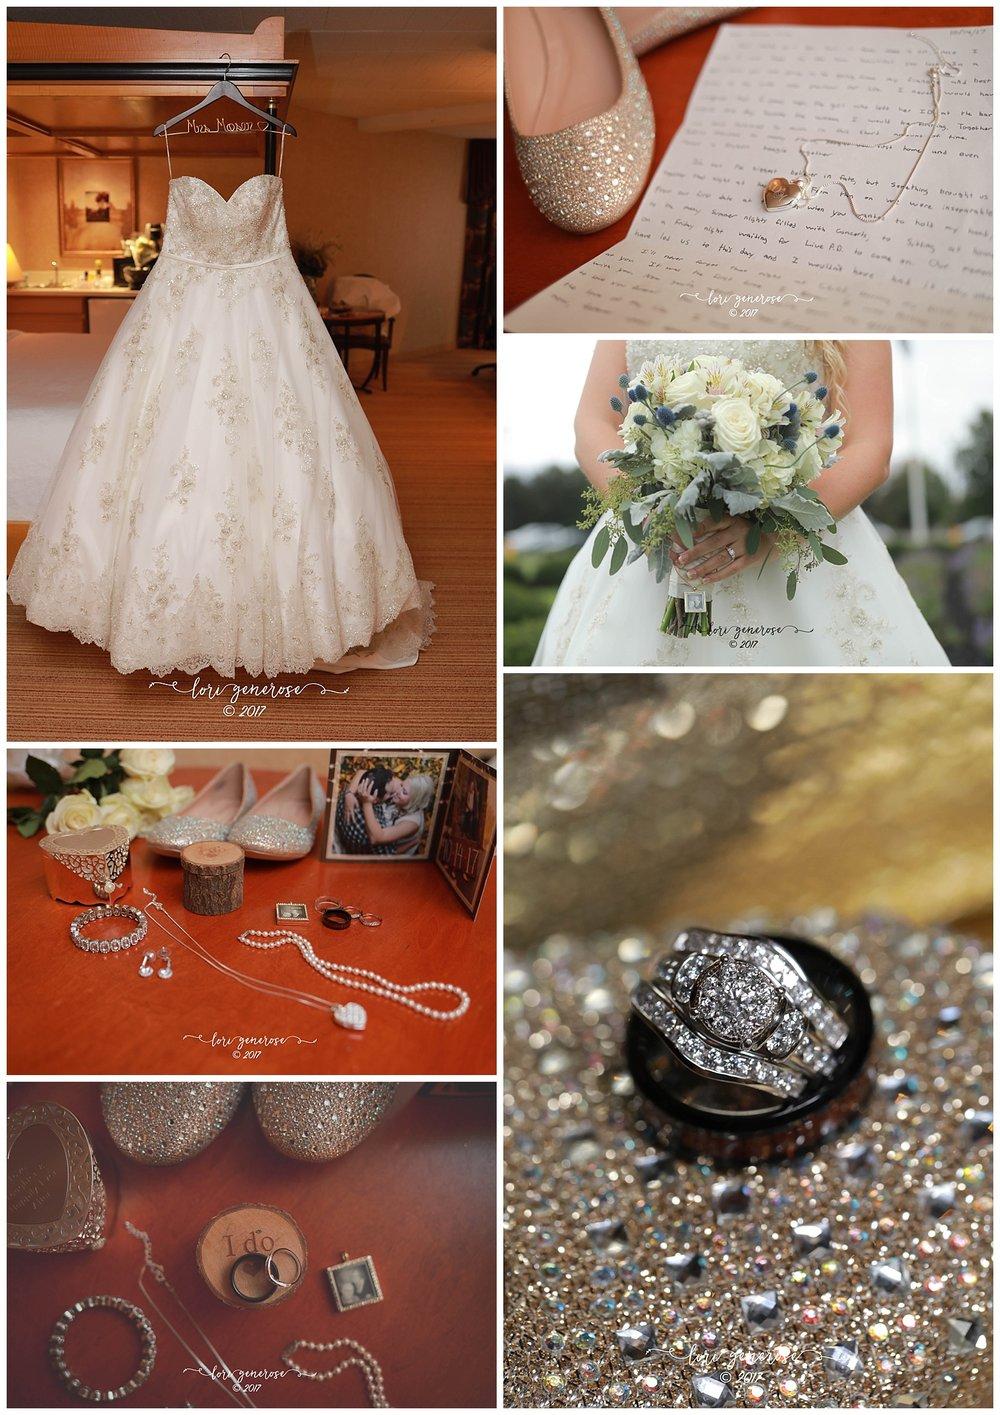 weddingdetailsbridedressringsflowersshoes.jpg